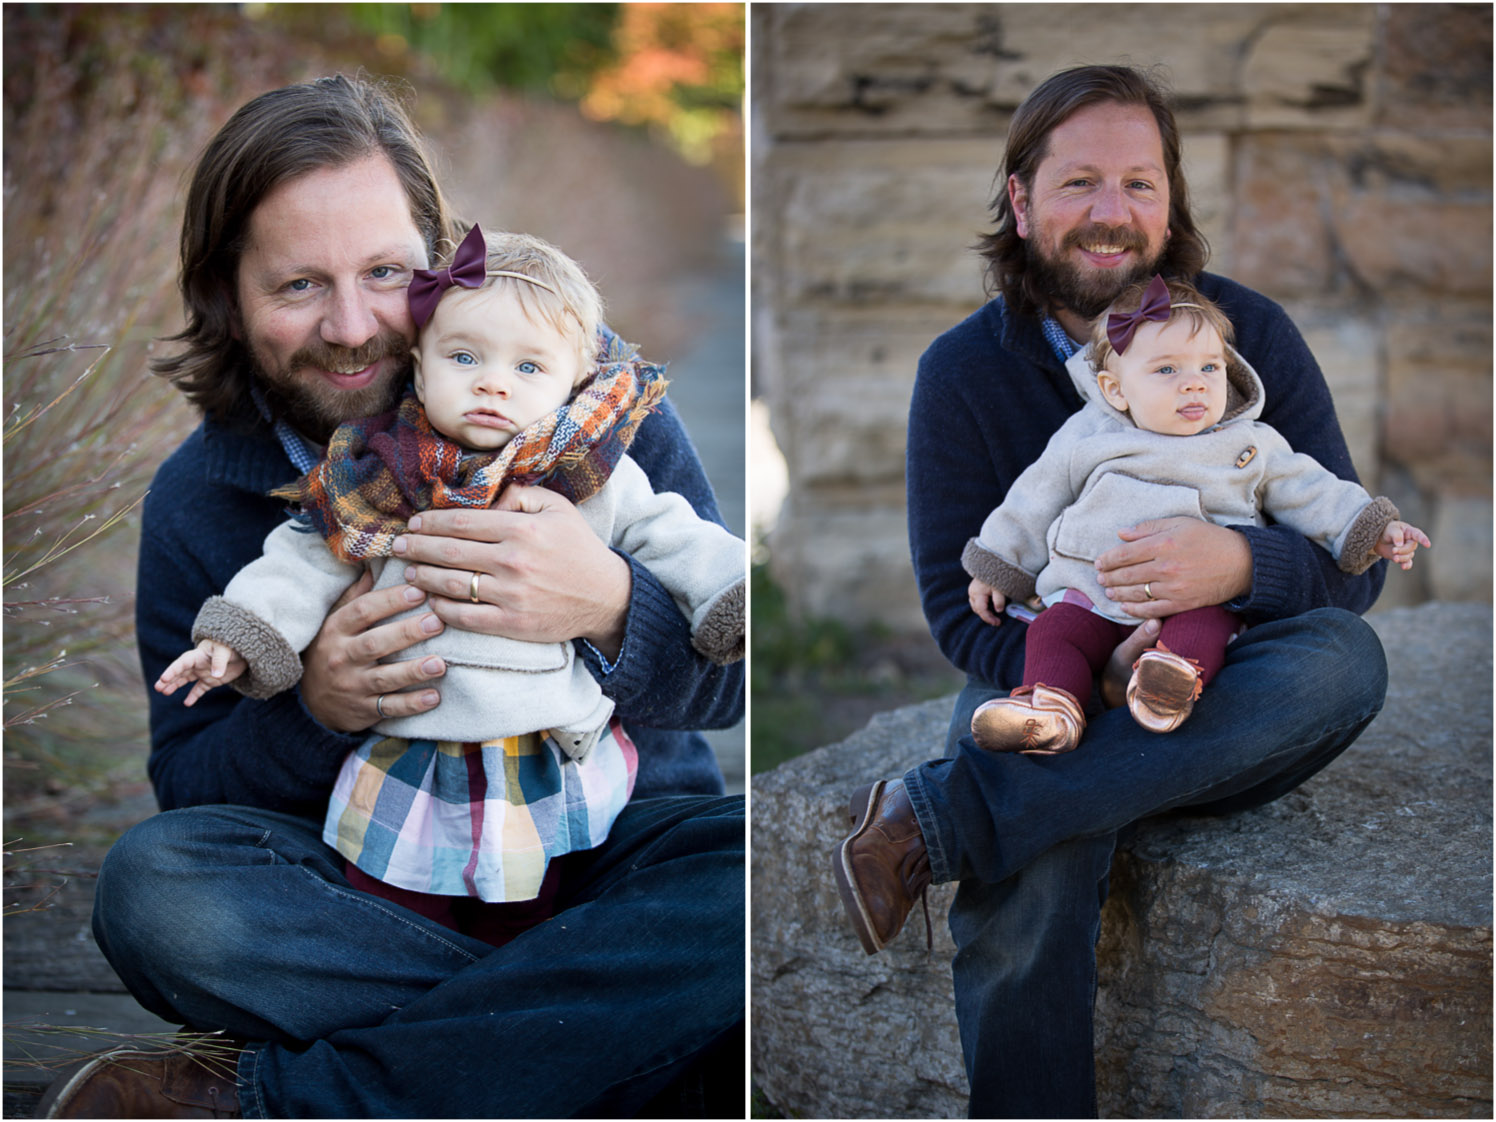 09-minnesota-fall-family-session-9-nine-month-old-girl-mill-city-minneapolis-mahonen-photography.jpg